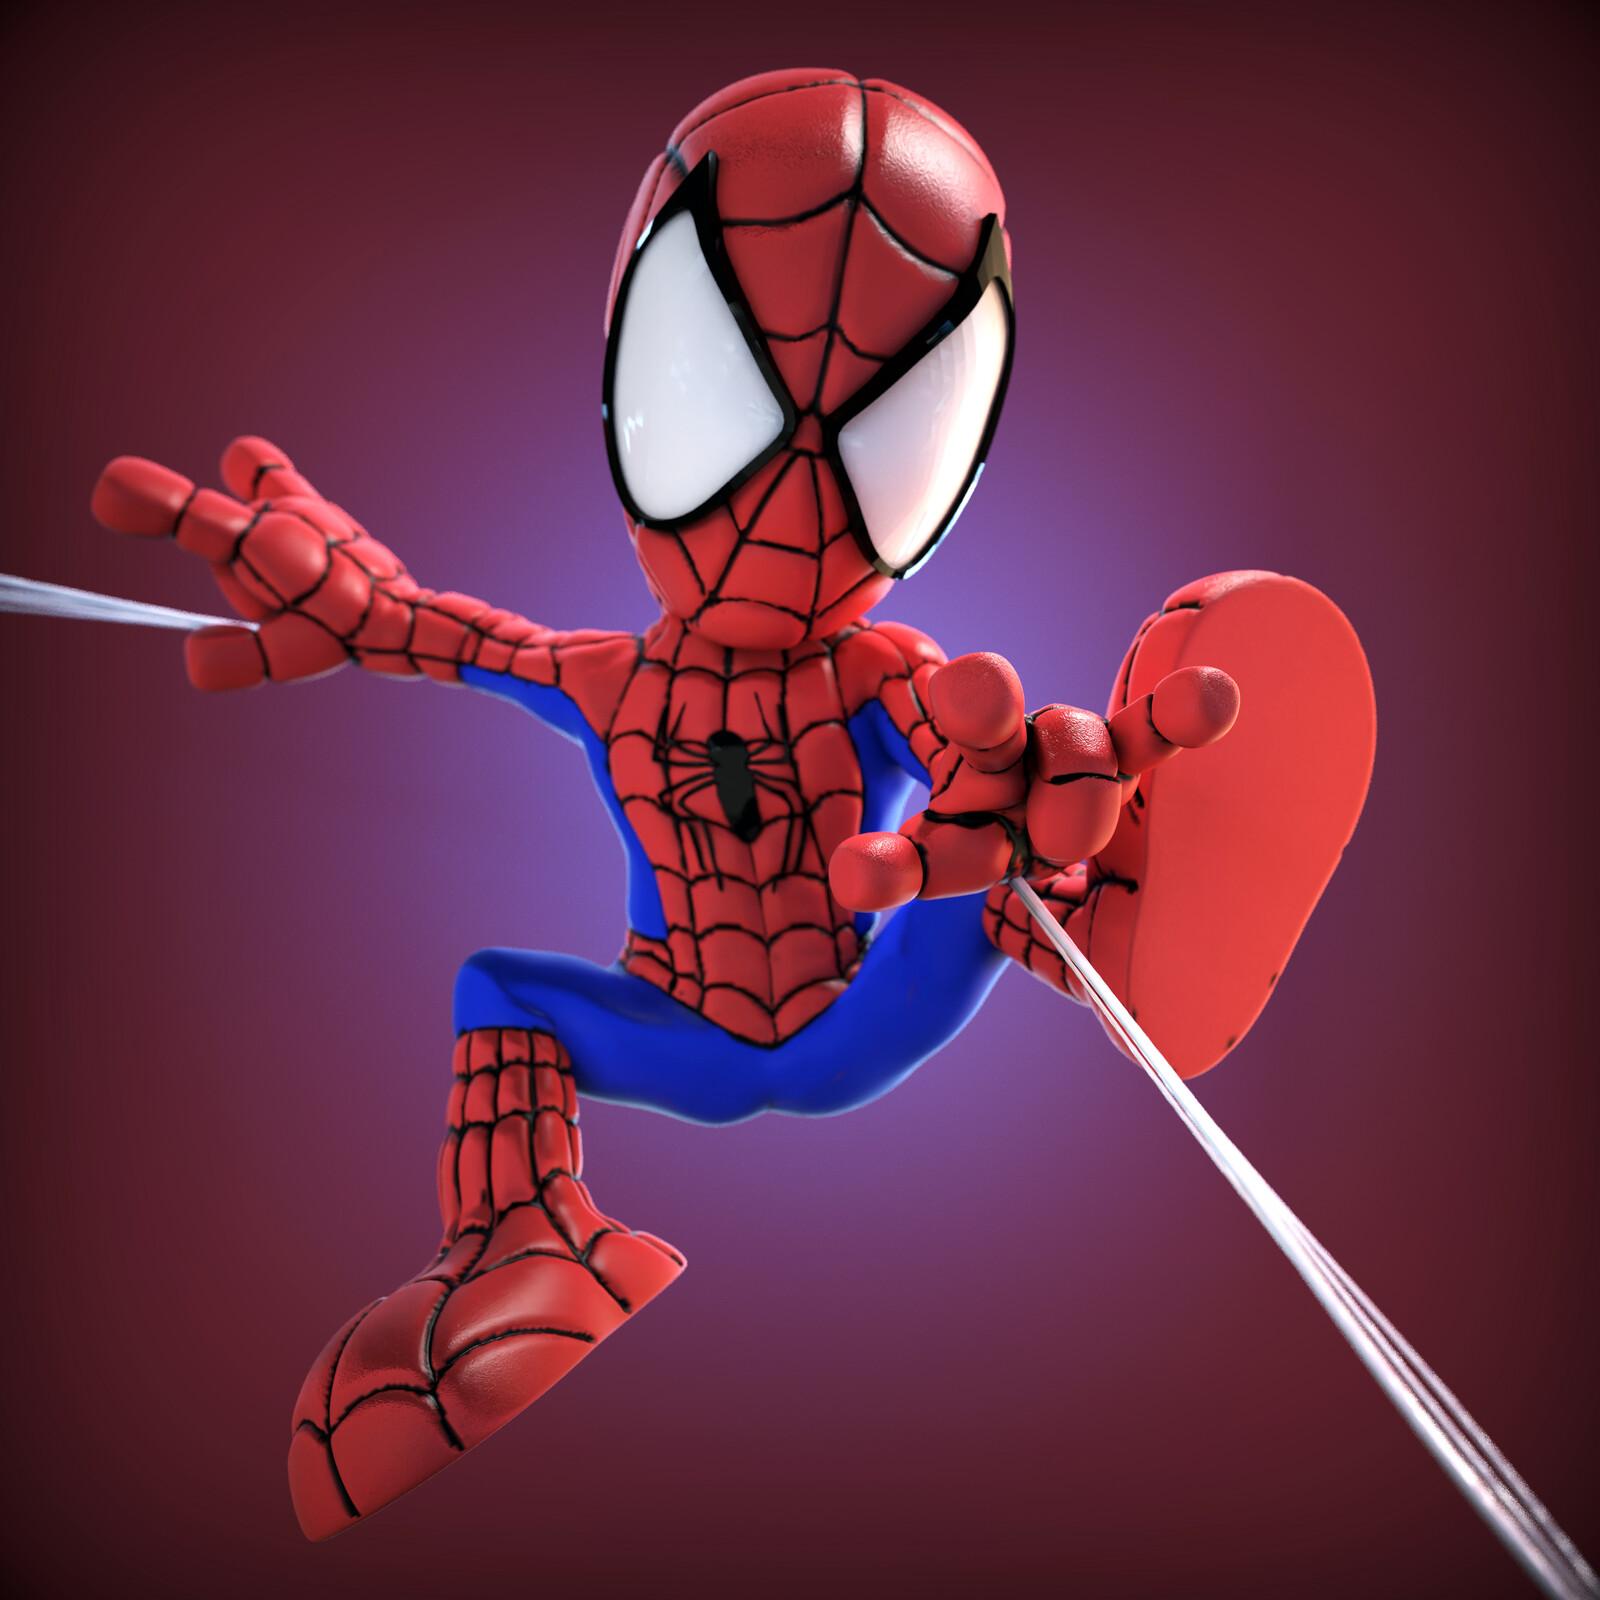 Chibi-Style Spider-Man